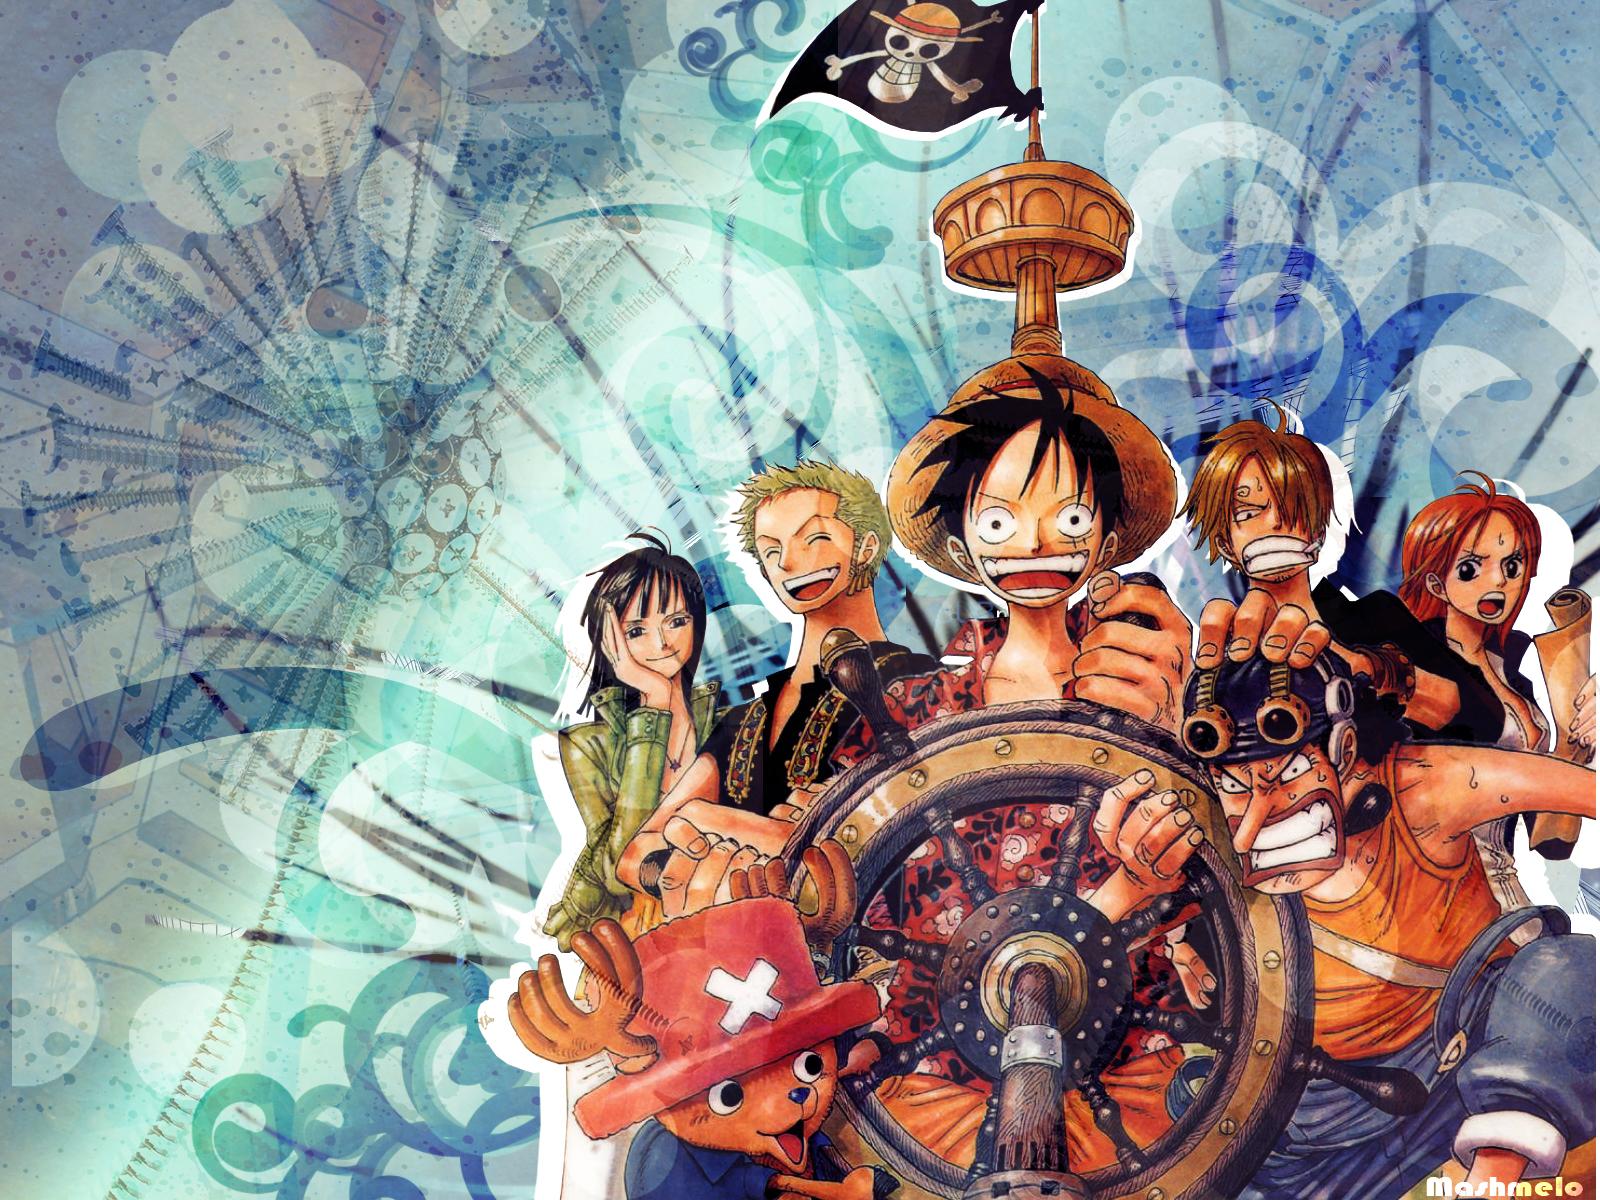 One Piece (anime) wallpaper | 1600x1200 | 198721 | WallpaperUP